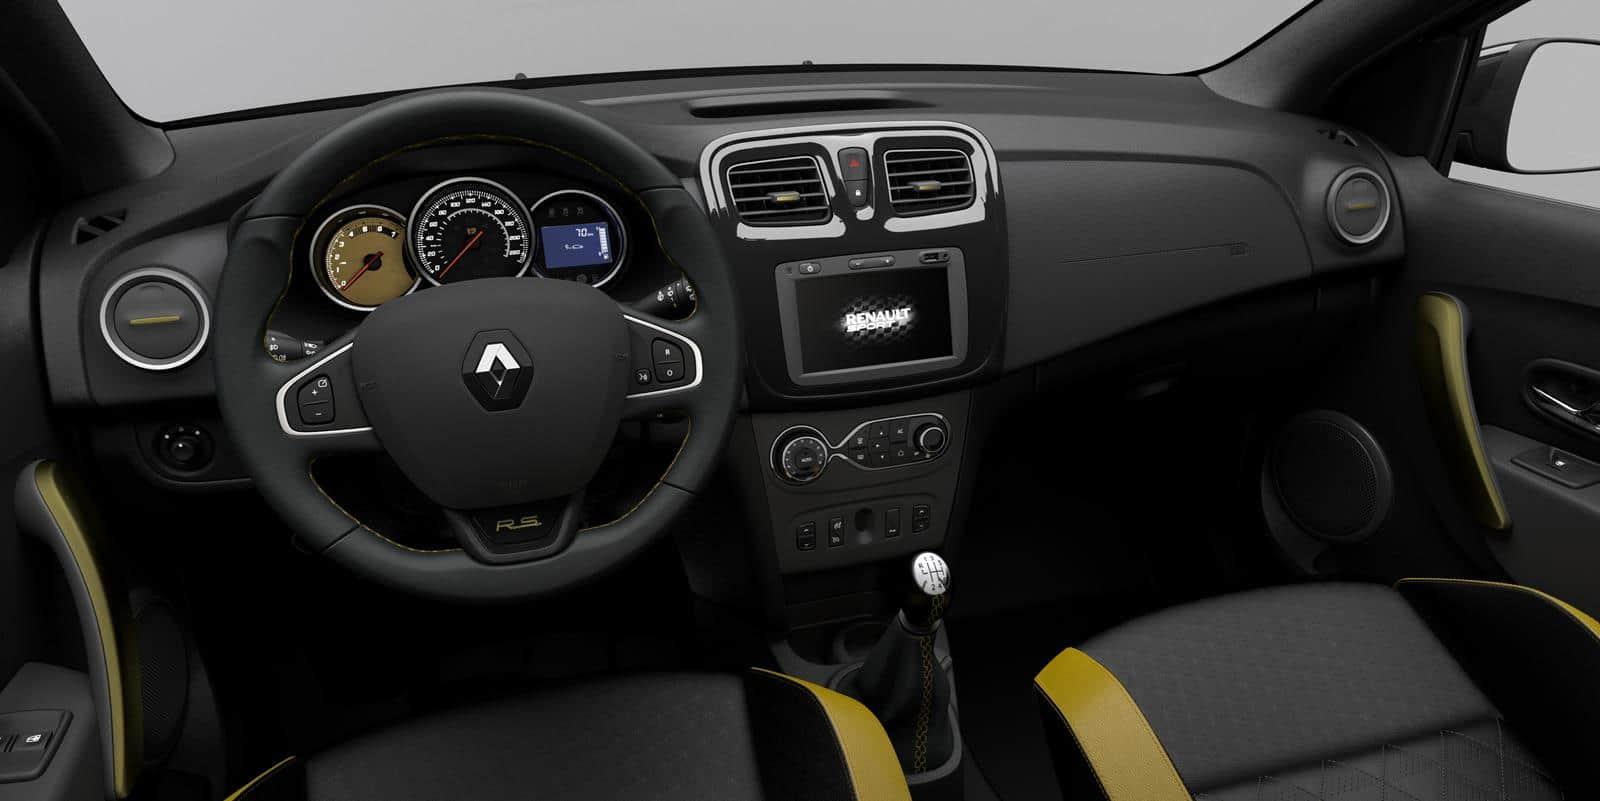 2016-renault-sandero-rs-grand-prix-concept-8